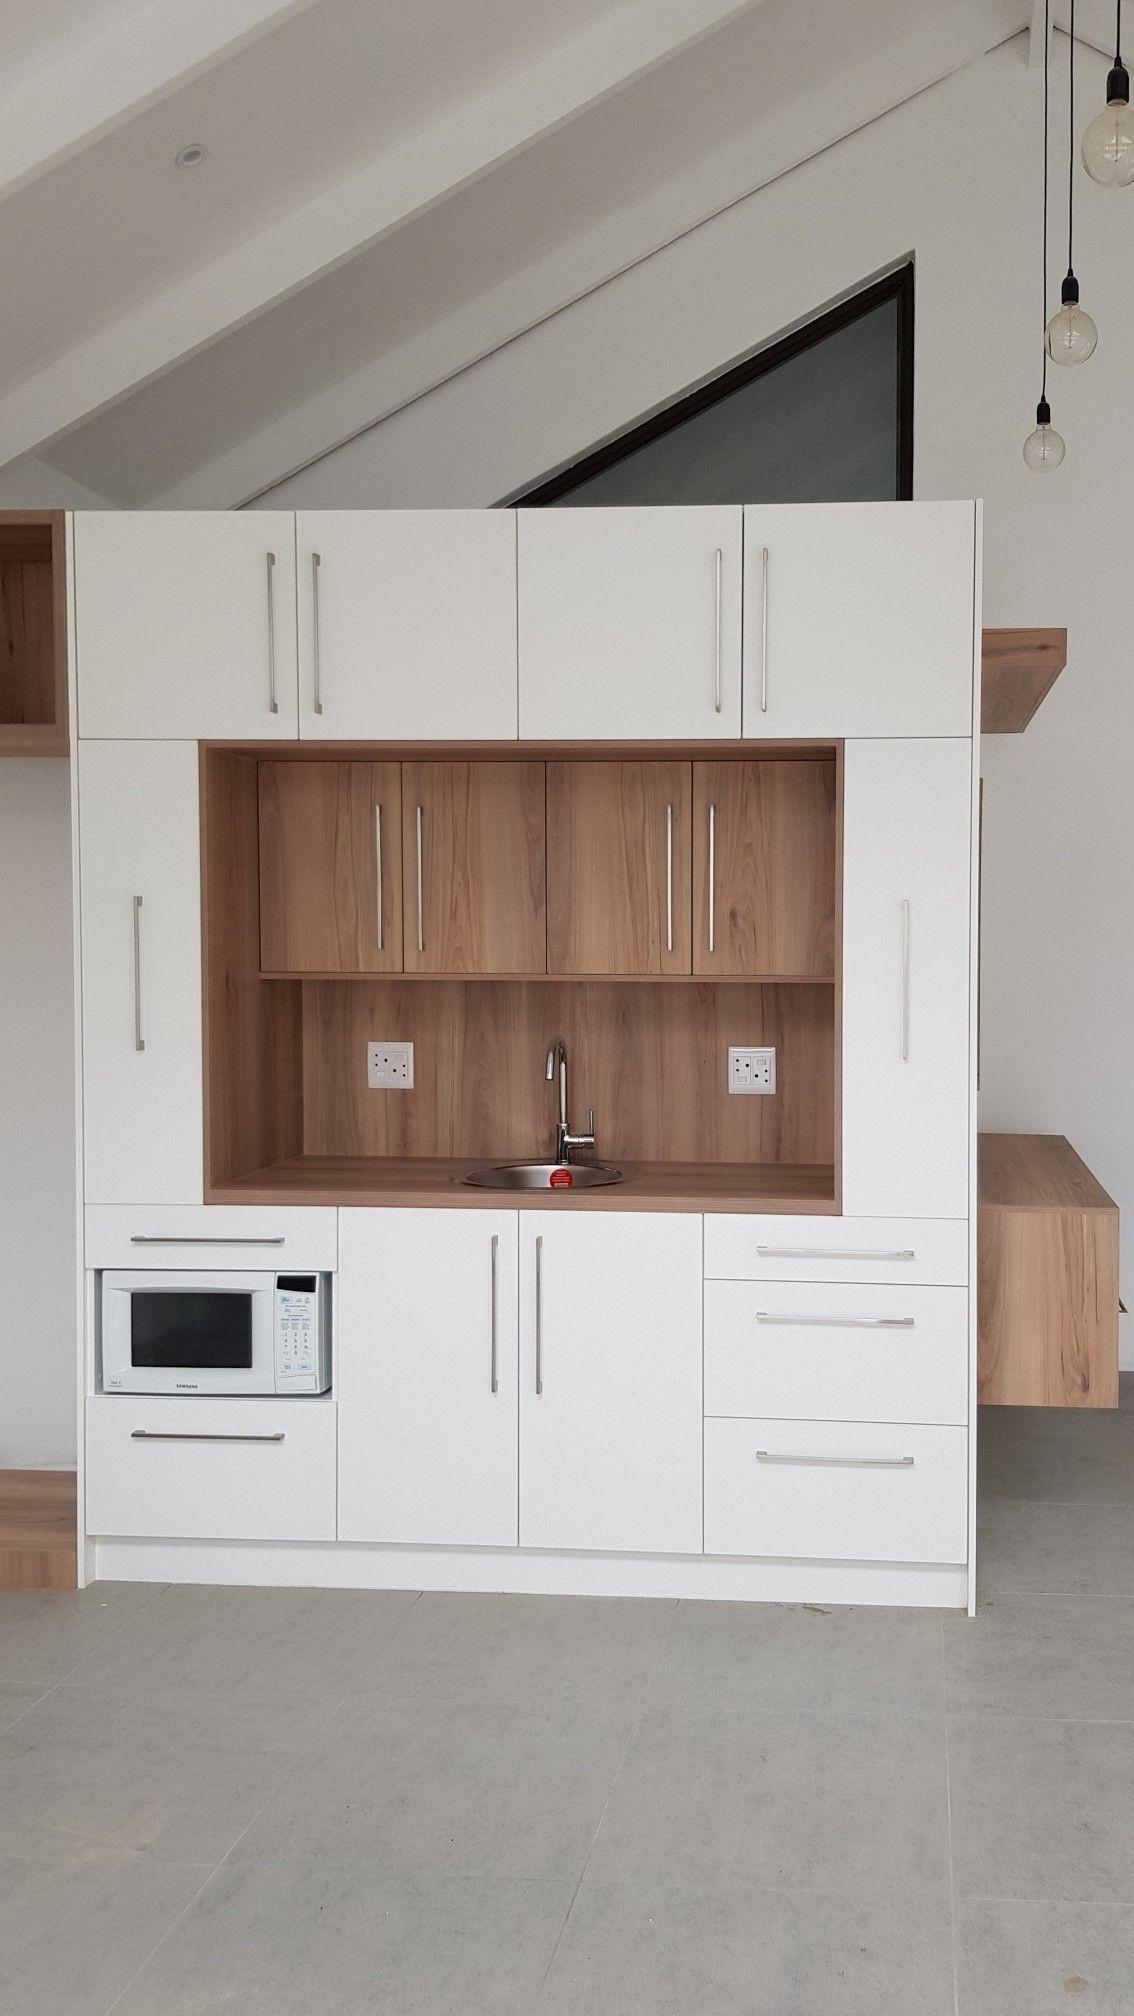 White Kitchen Contemporary Kitchen Small Kitchens Small Spaces Custom Cupboard Len S Custom Interior Design Kitchen Contemporary Kitchen Kitchen Interior